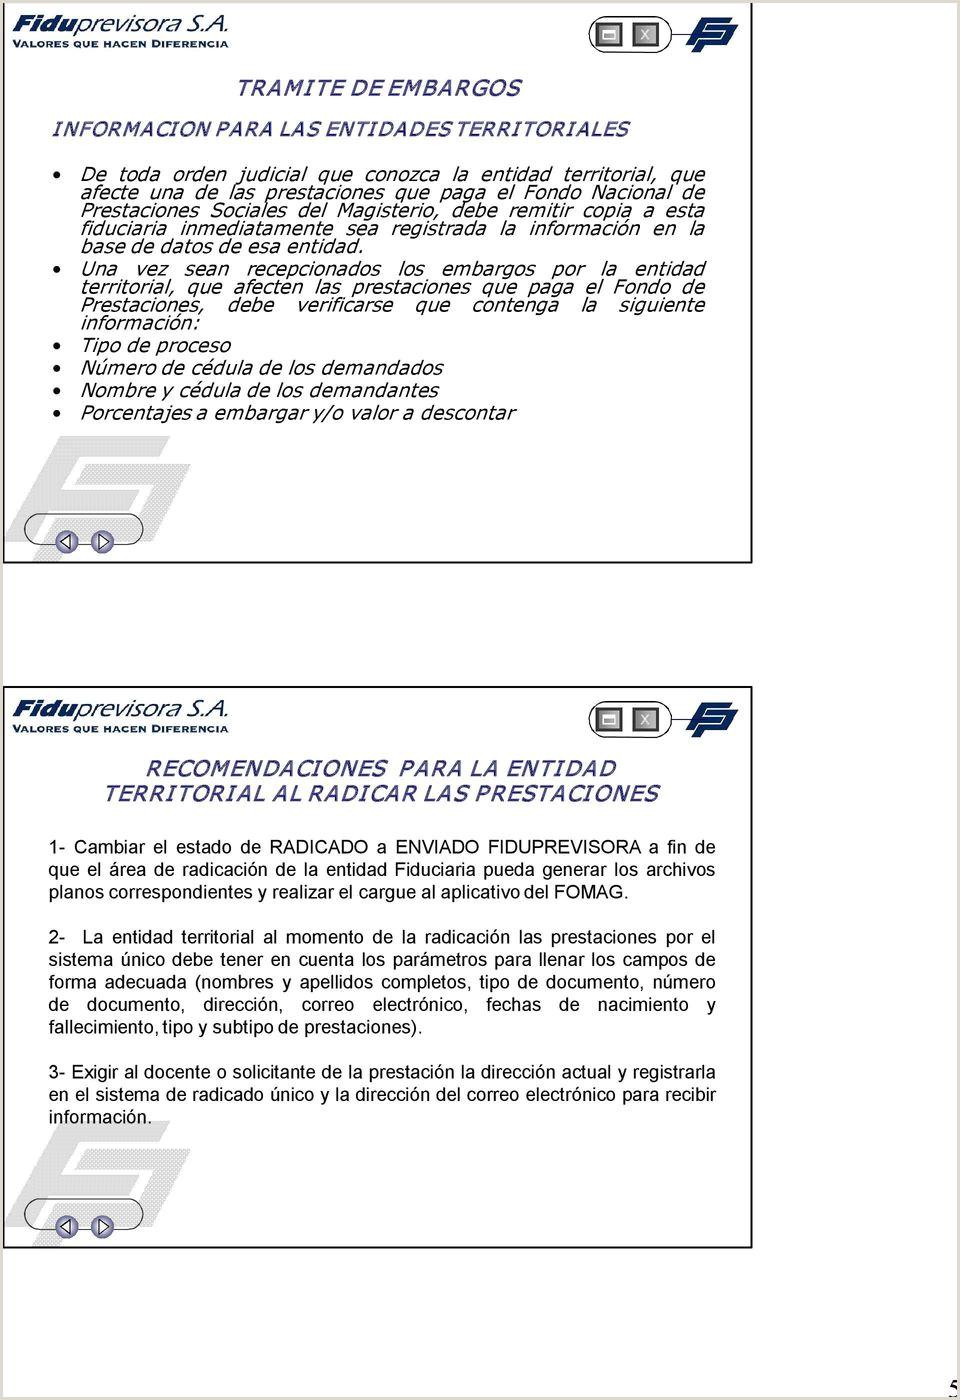 Formato Hoja De Vida Fiduprevisora Fondo Nacional De P Restaciones sociales Del Magisterio Fnp